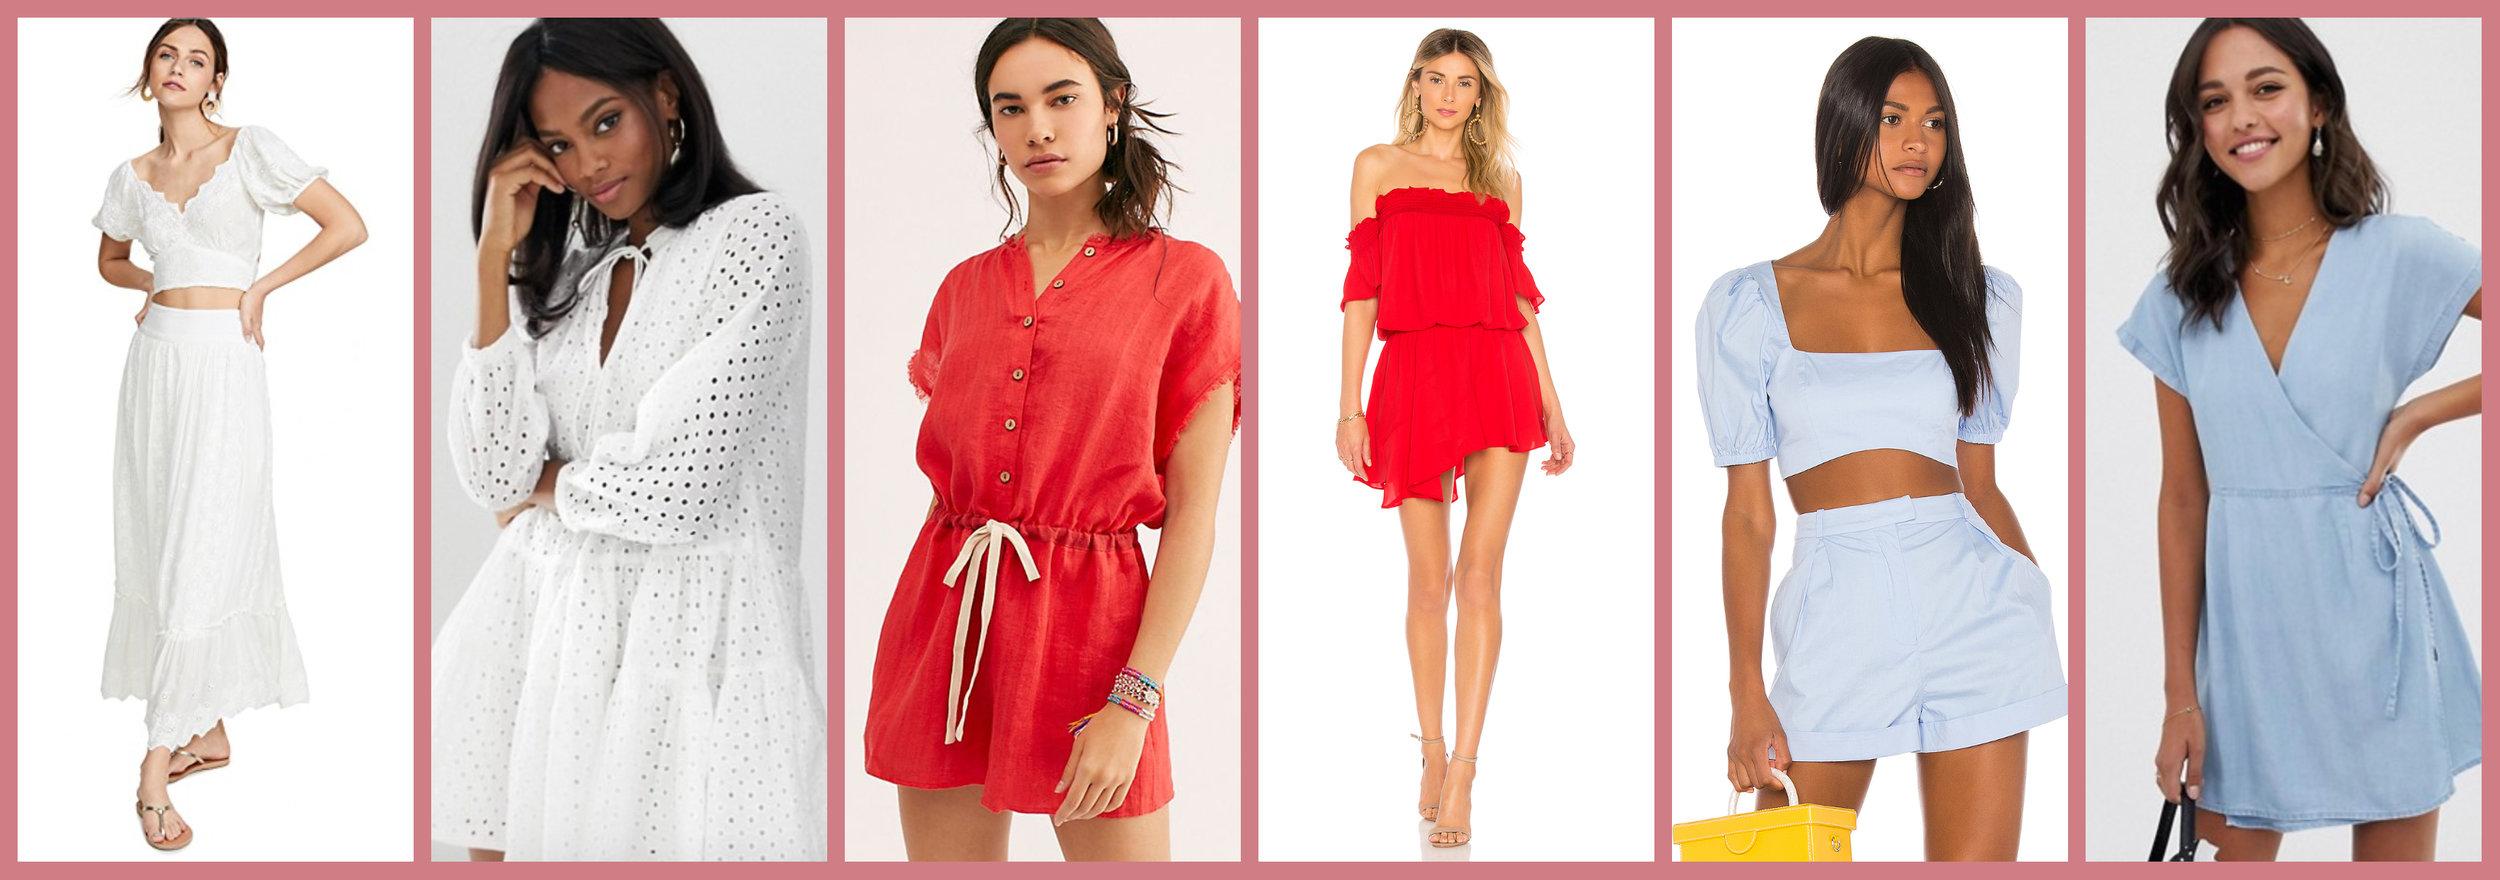 Bohemian Set     Eyelet Dress       Red Romper       OTS Mini     Baby Blue Set       Chambray Wrap Dress